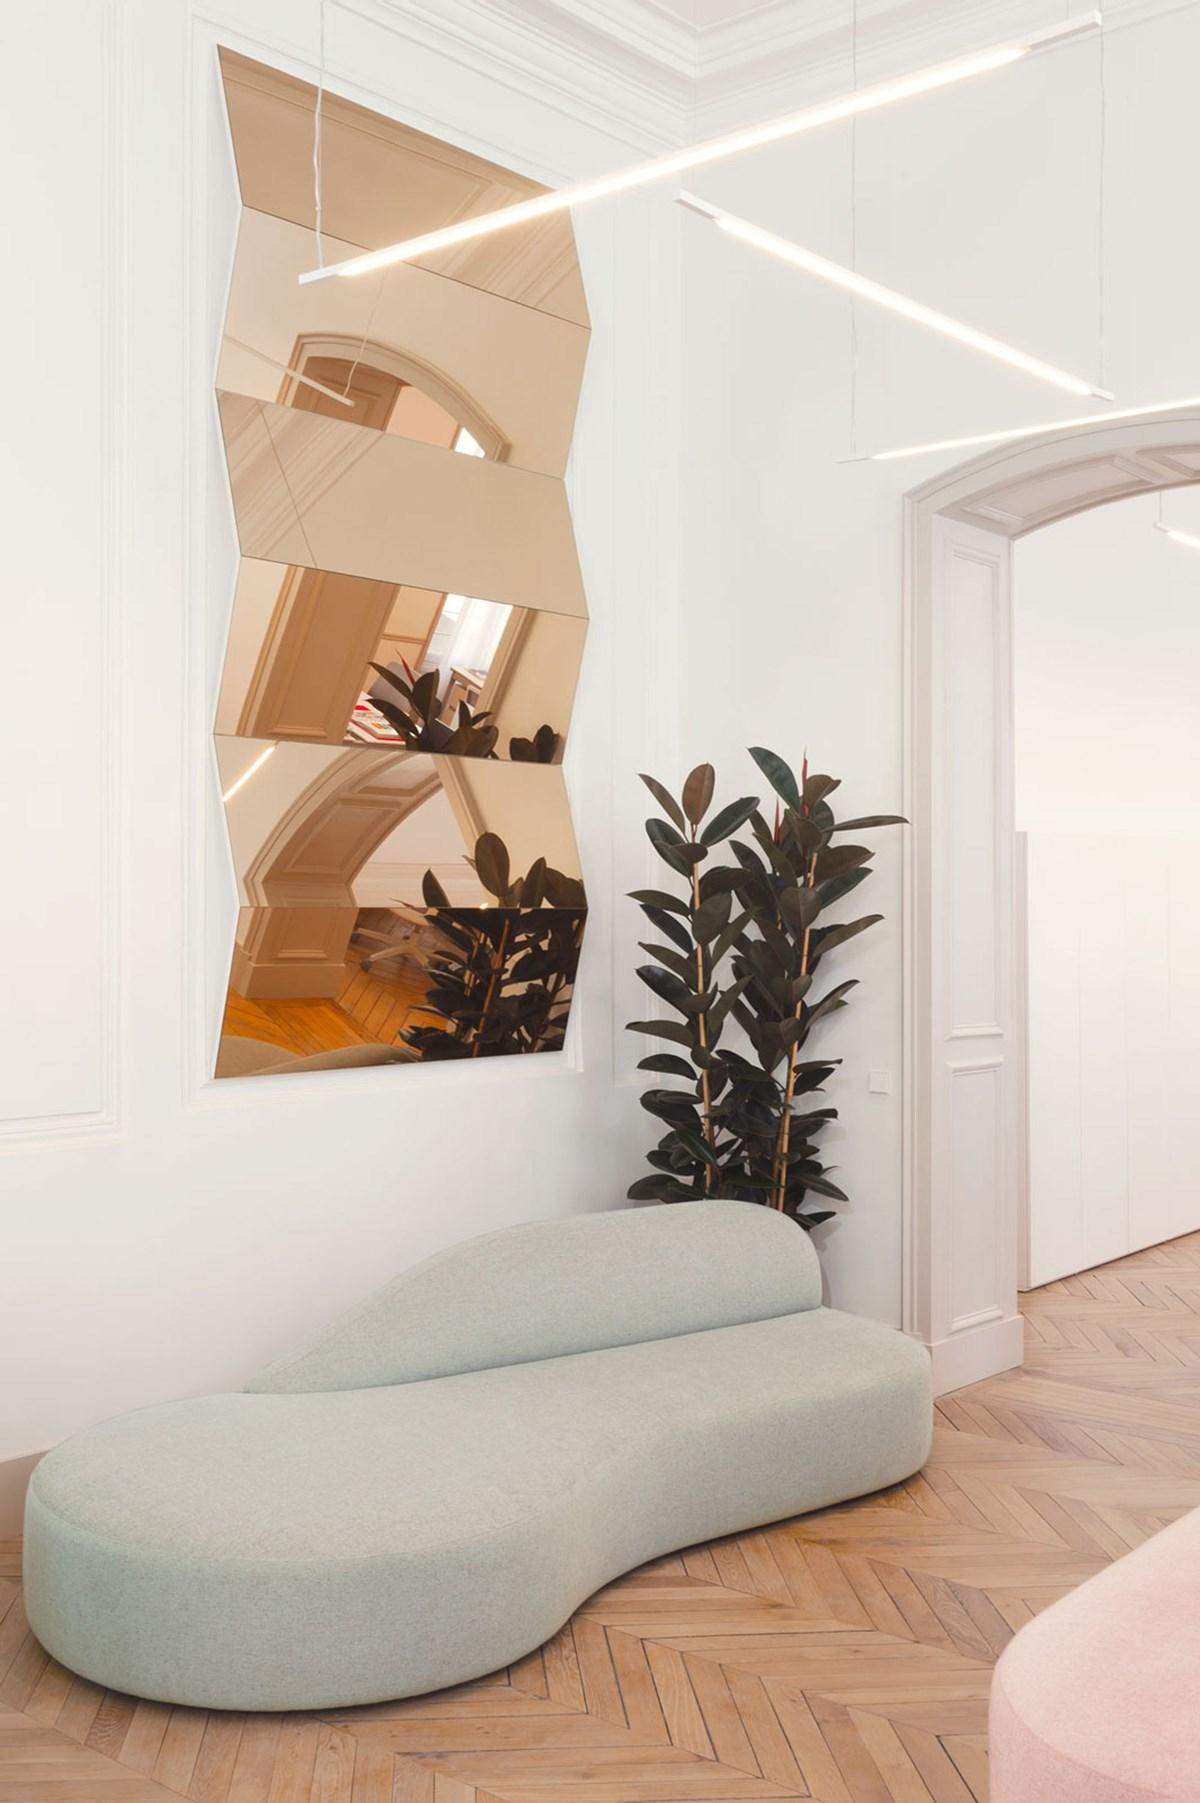 Nemo-Nemo-Design-Linescapes-Horizontal-Pendant-Light-Matisse-5